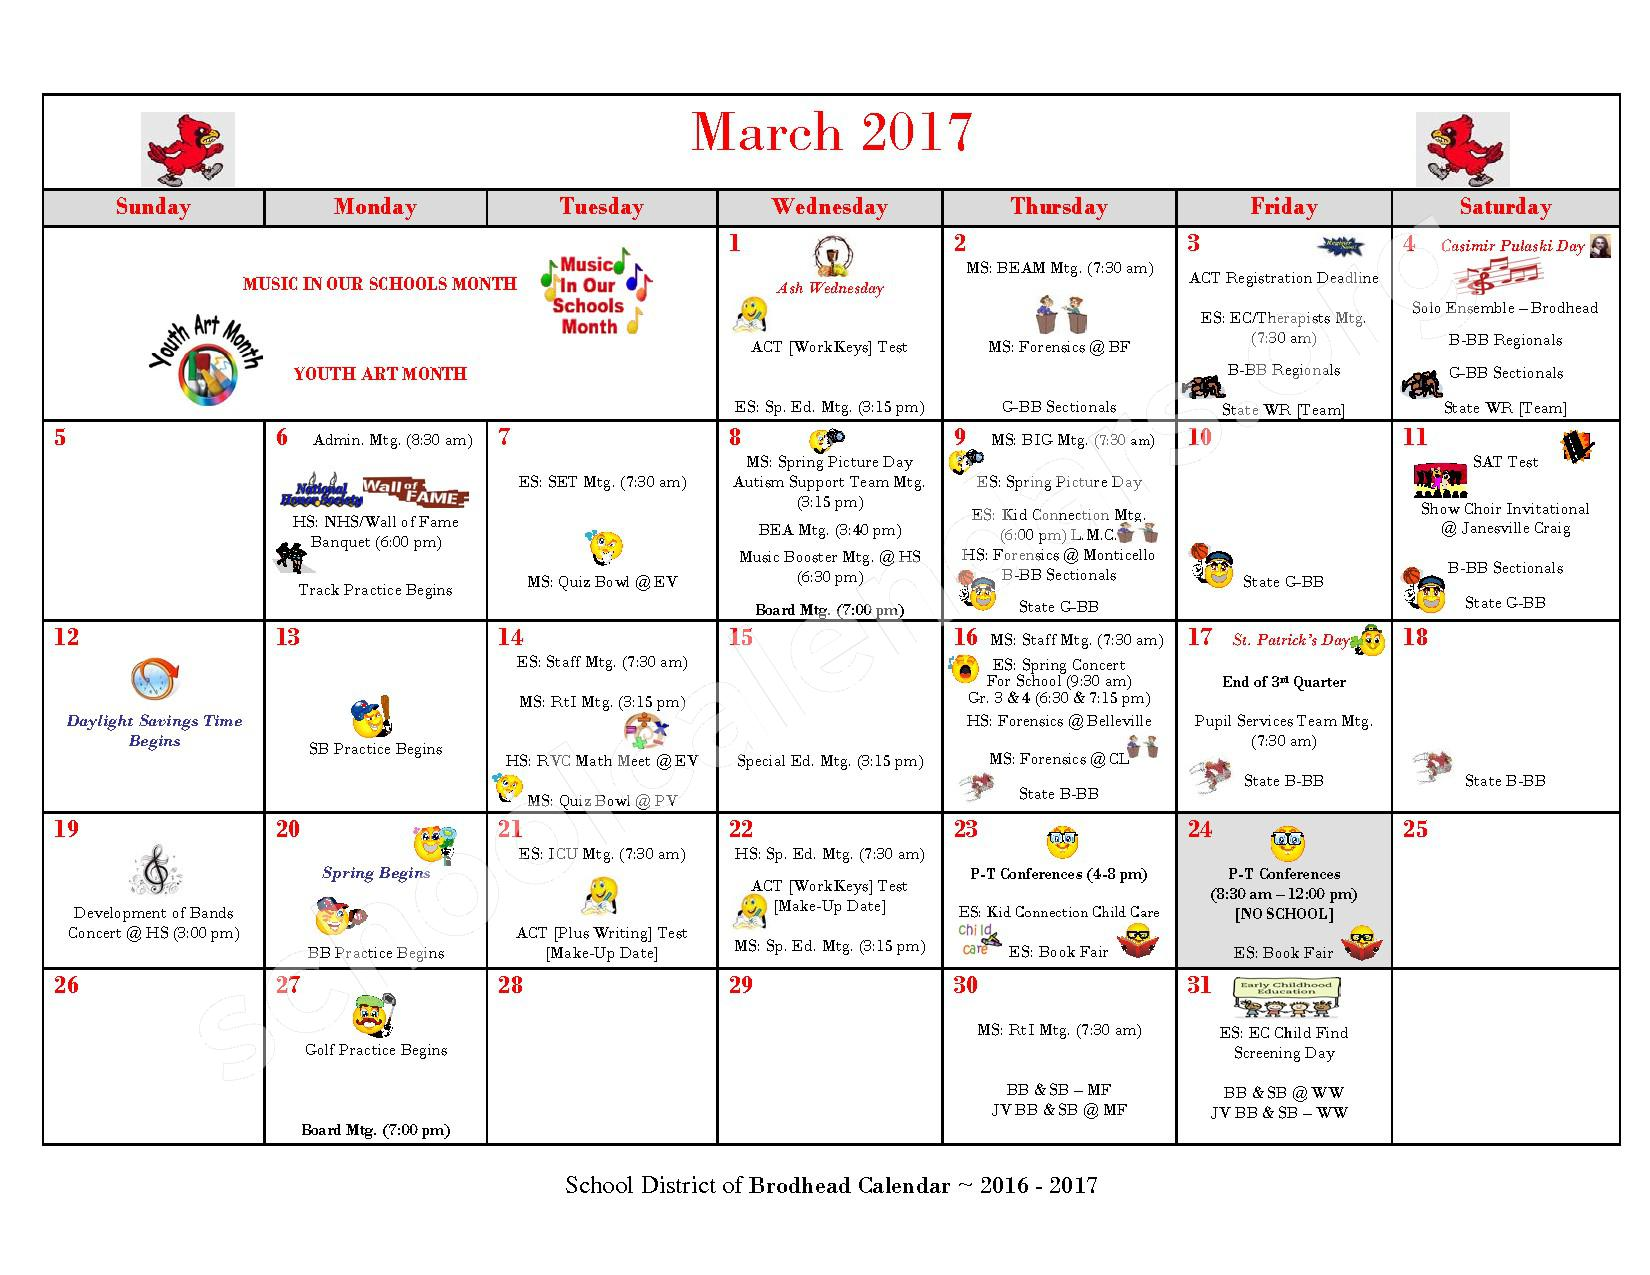 2016 - 2017 School Calendar – Brodhead School District – page 8